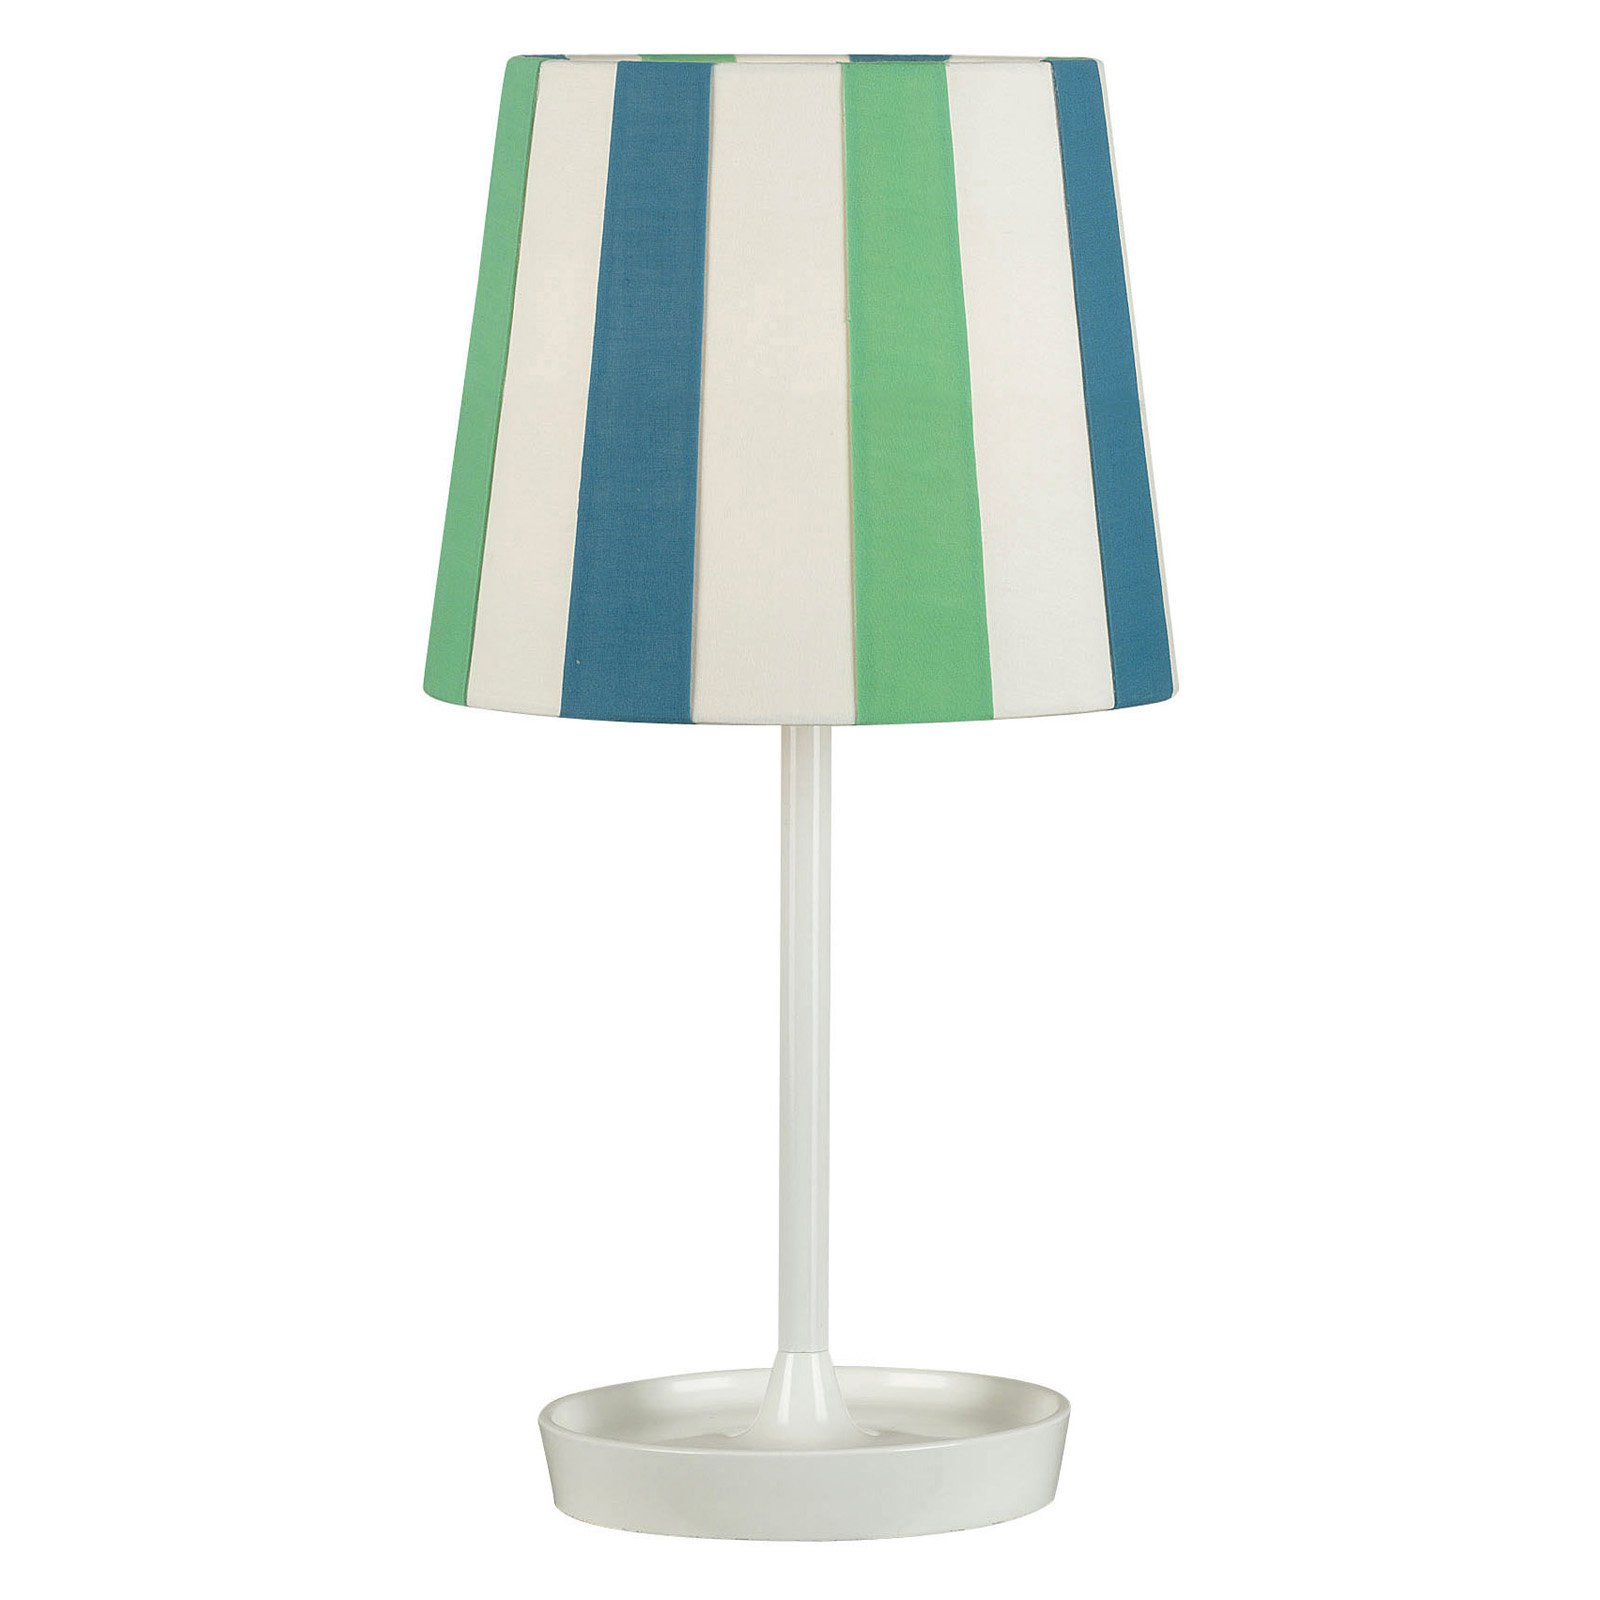 Kenroy Home Raya Accent Lamp - Blue